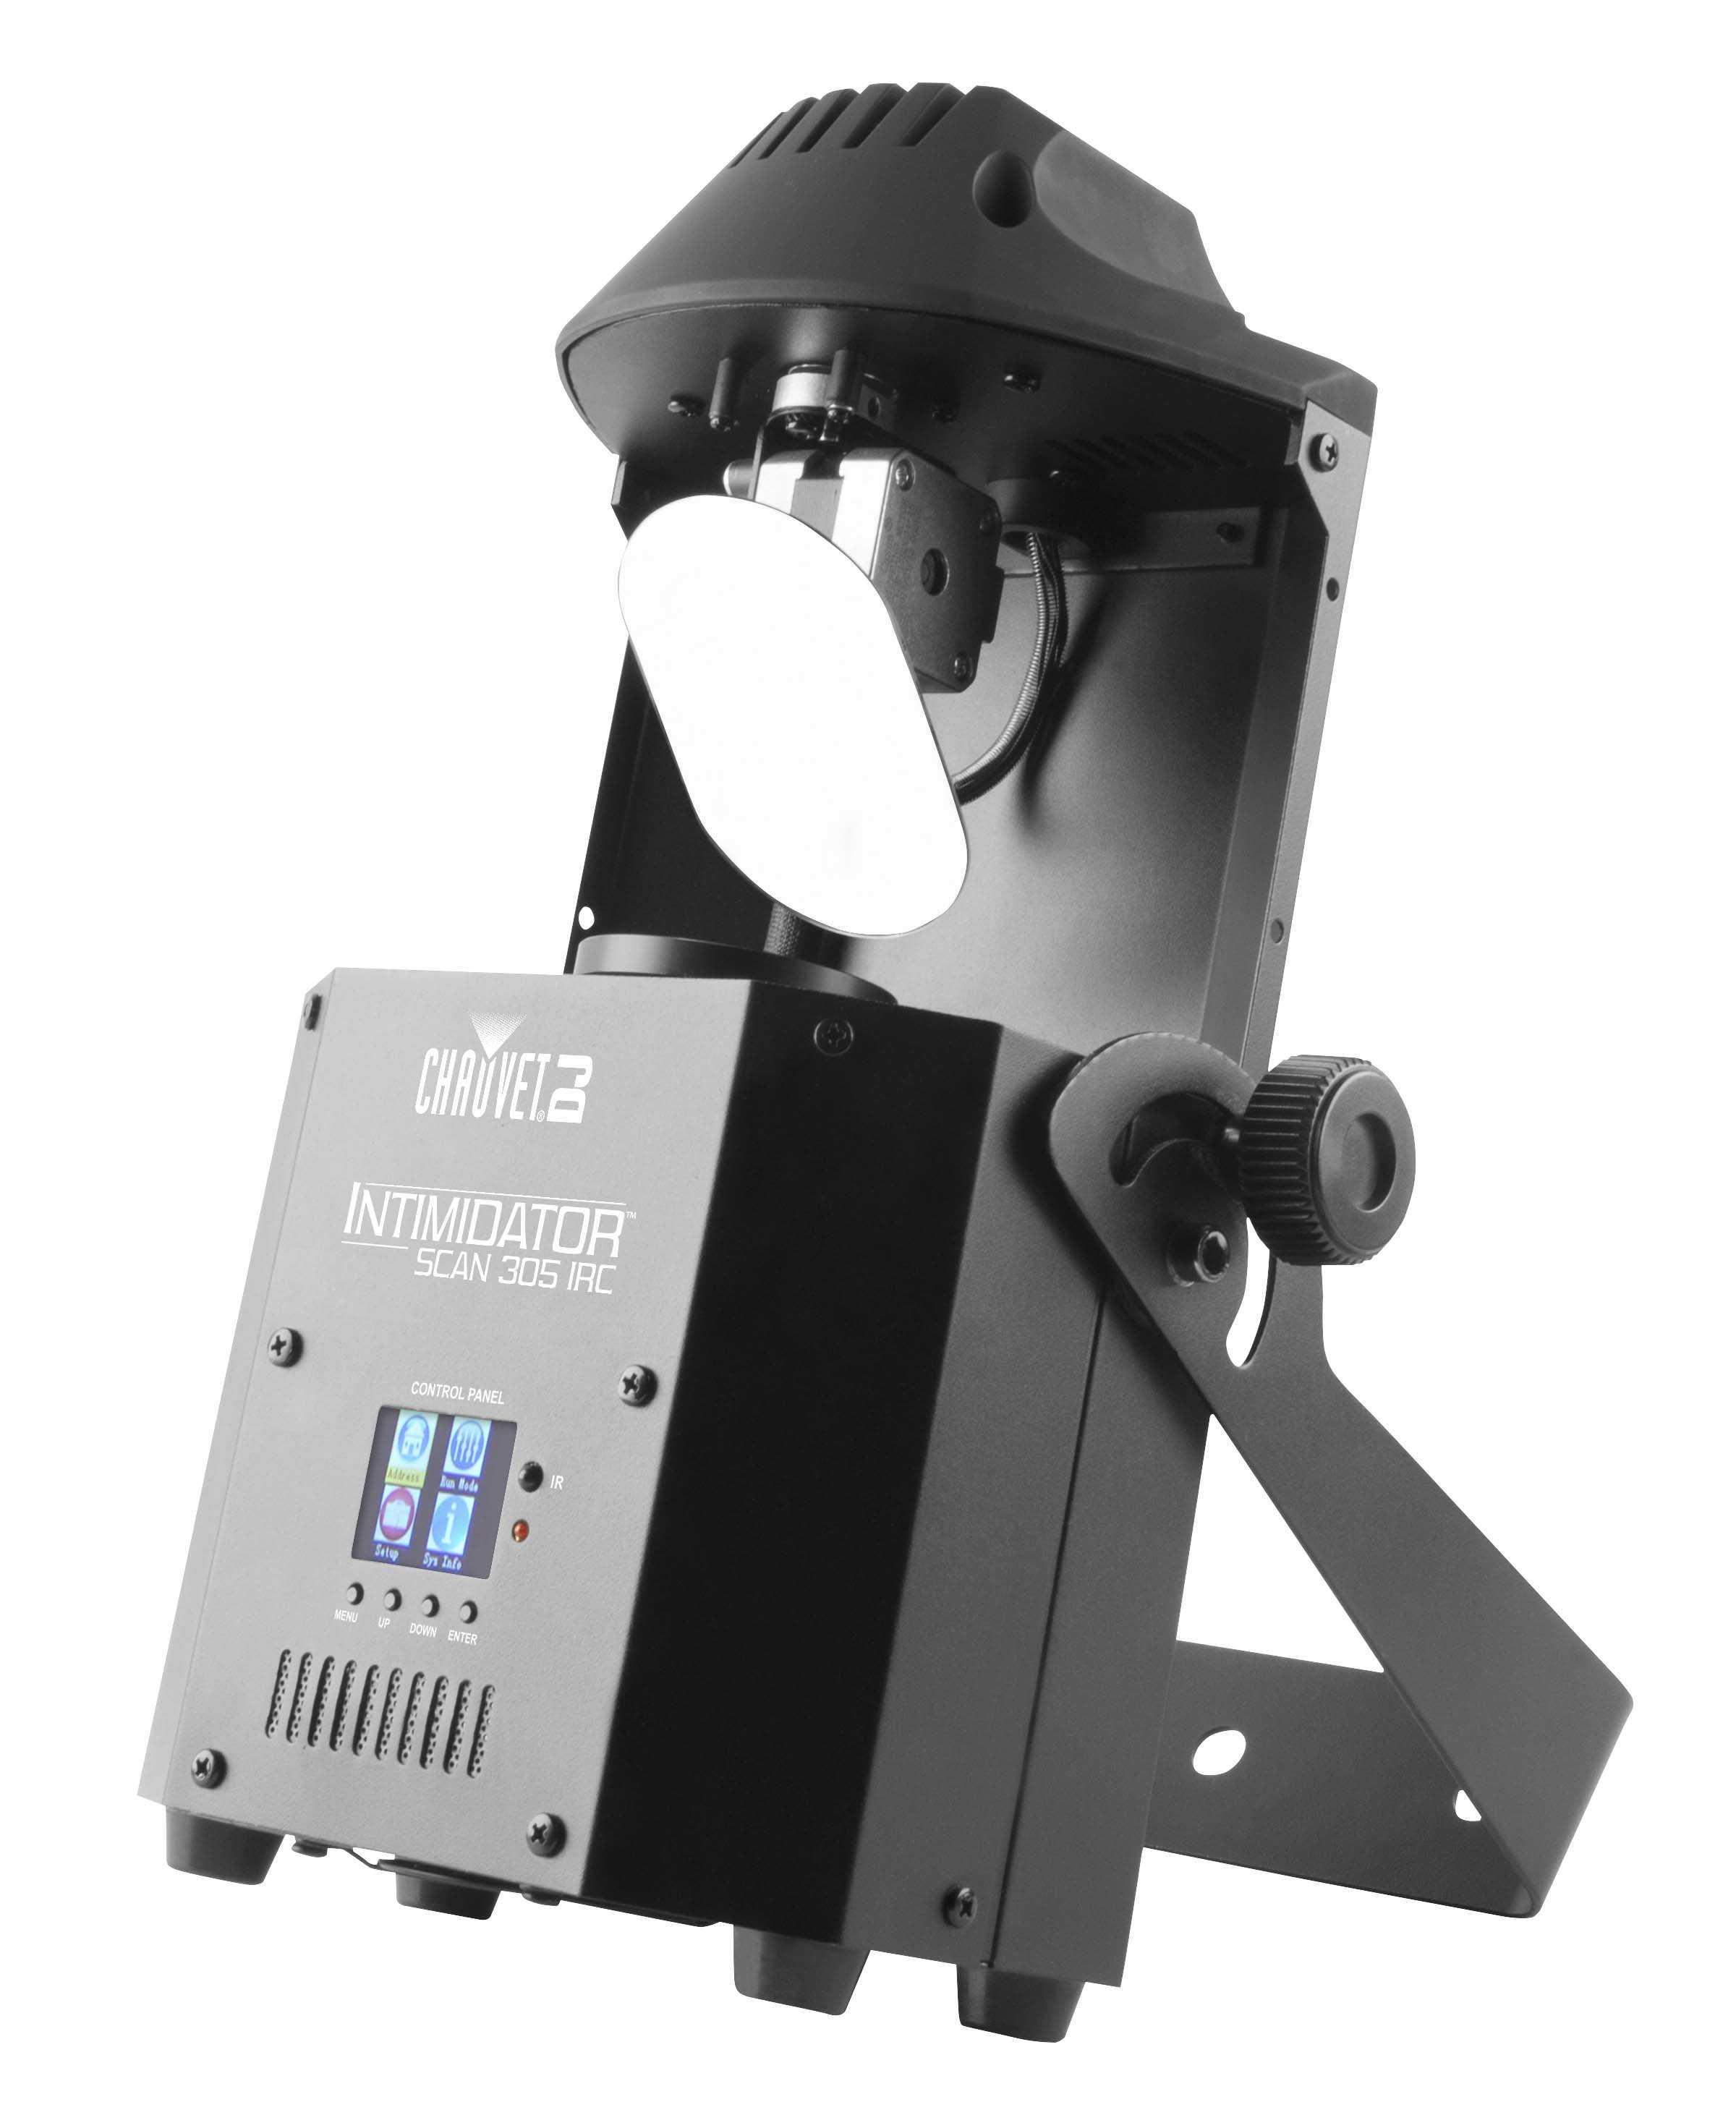 chauvet-dj-intimidator-scan-305-irc.jpg